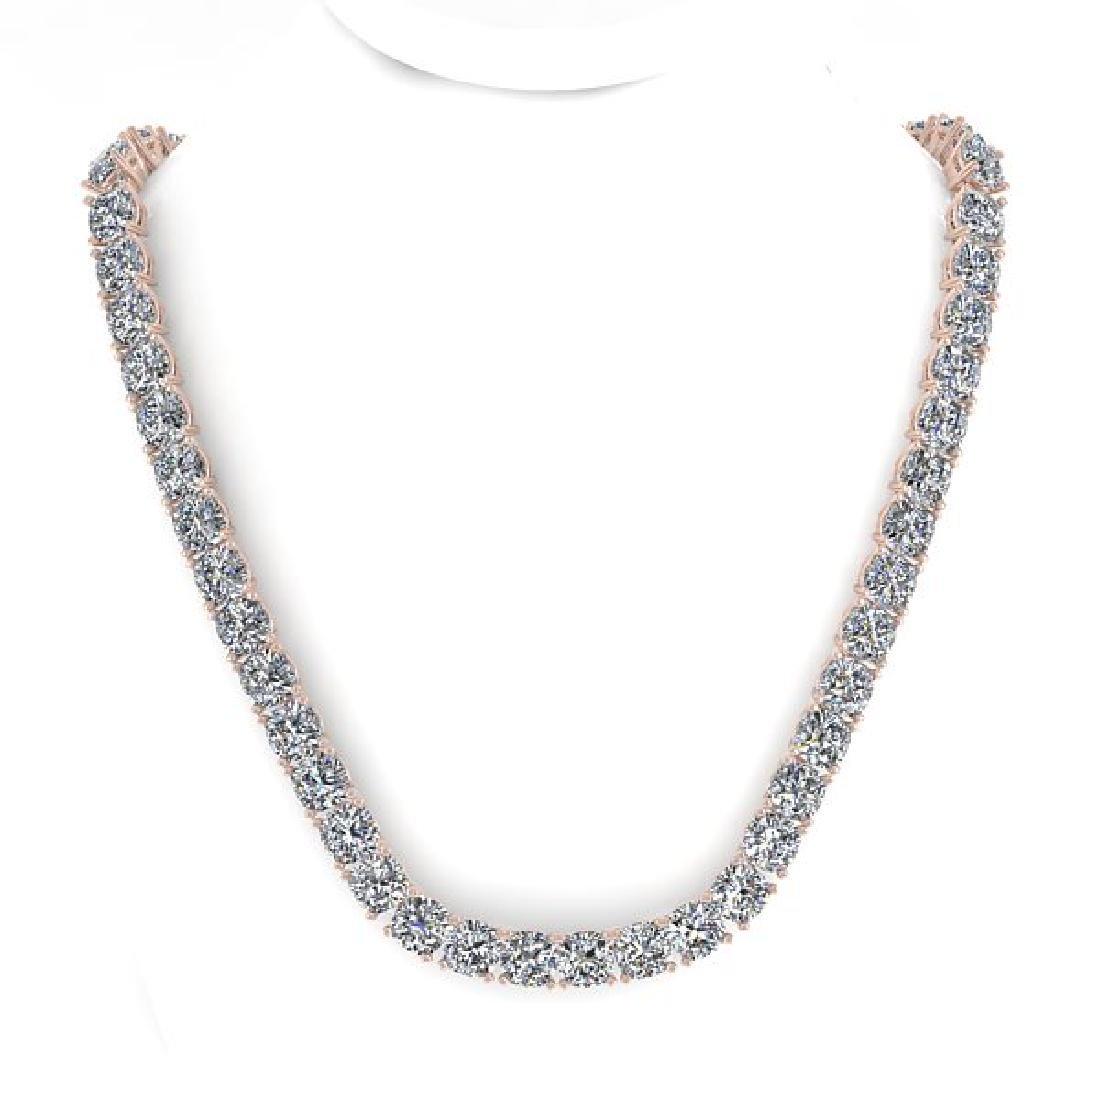 30 CTW Cushion Cut Certified SI Diamond Necklace 18K - 3